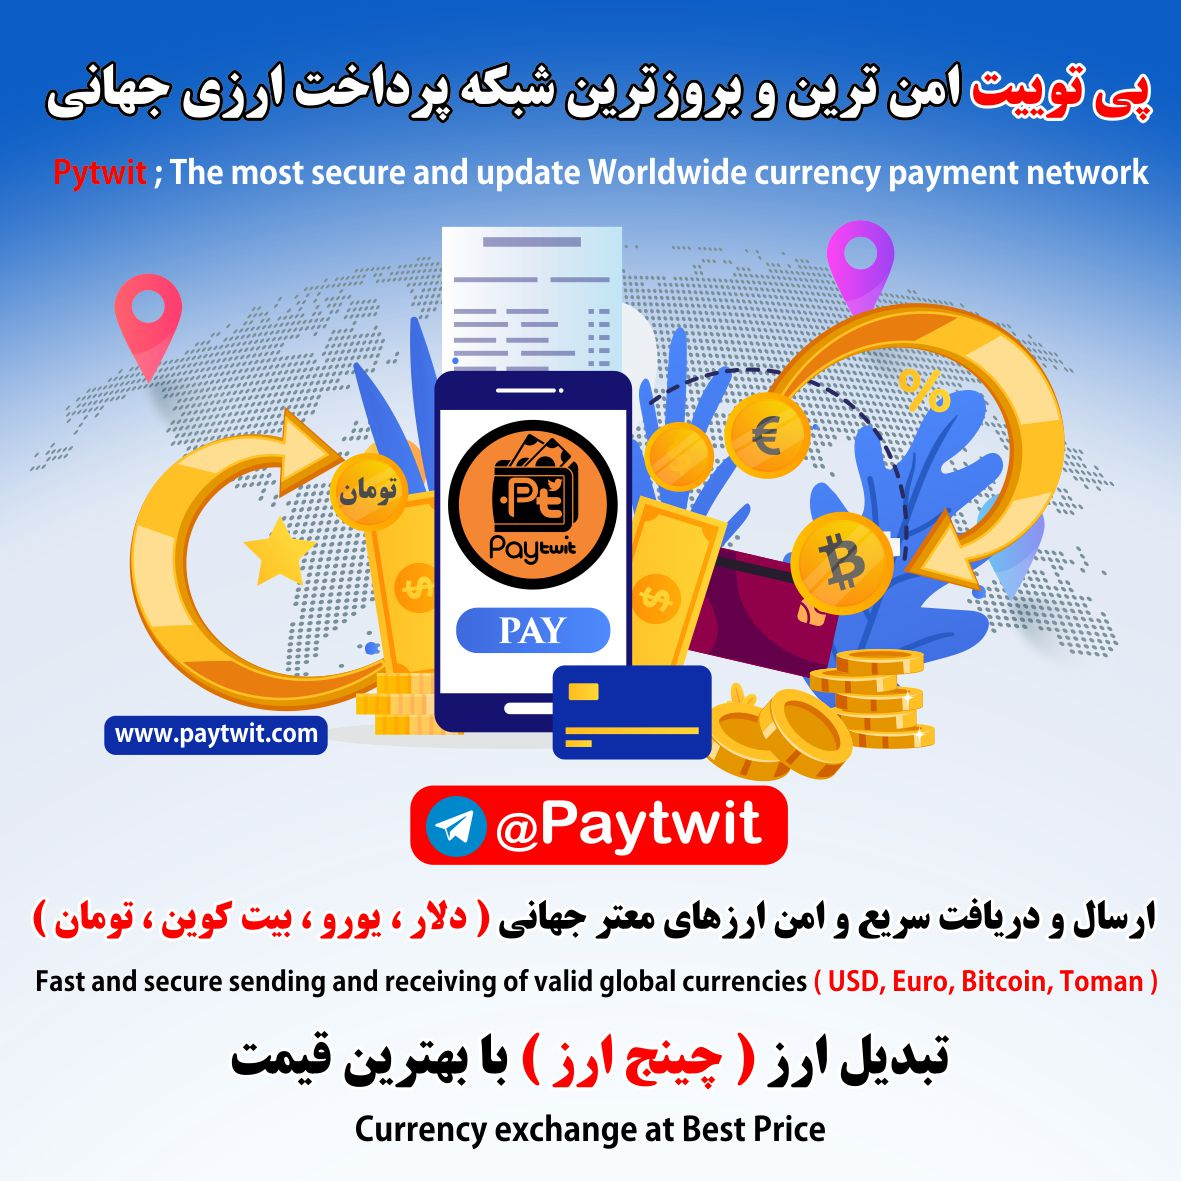 شارژ اکانت پی پال - پرداختهای بین المللی - خدمات وبمانی - خرید اسکریل - فروش پرفکت مانی